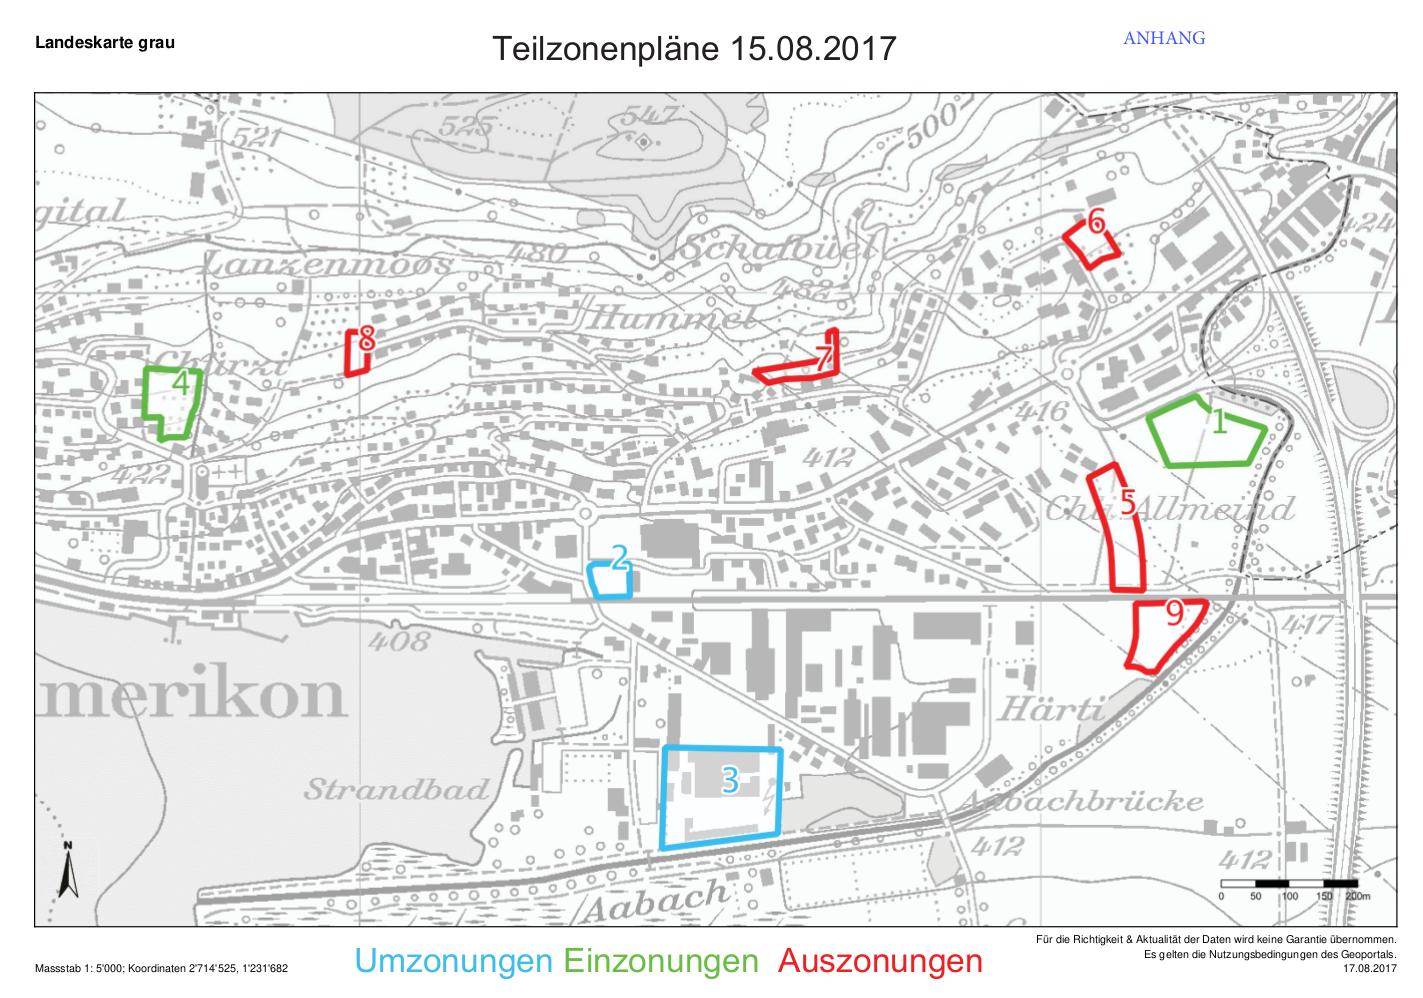 Teilzonenpläne 15.08.2017